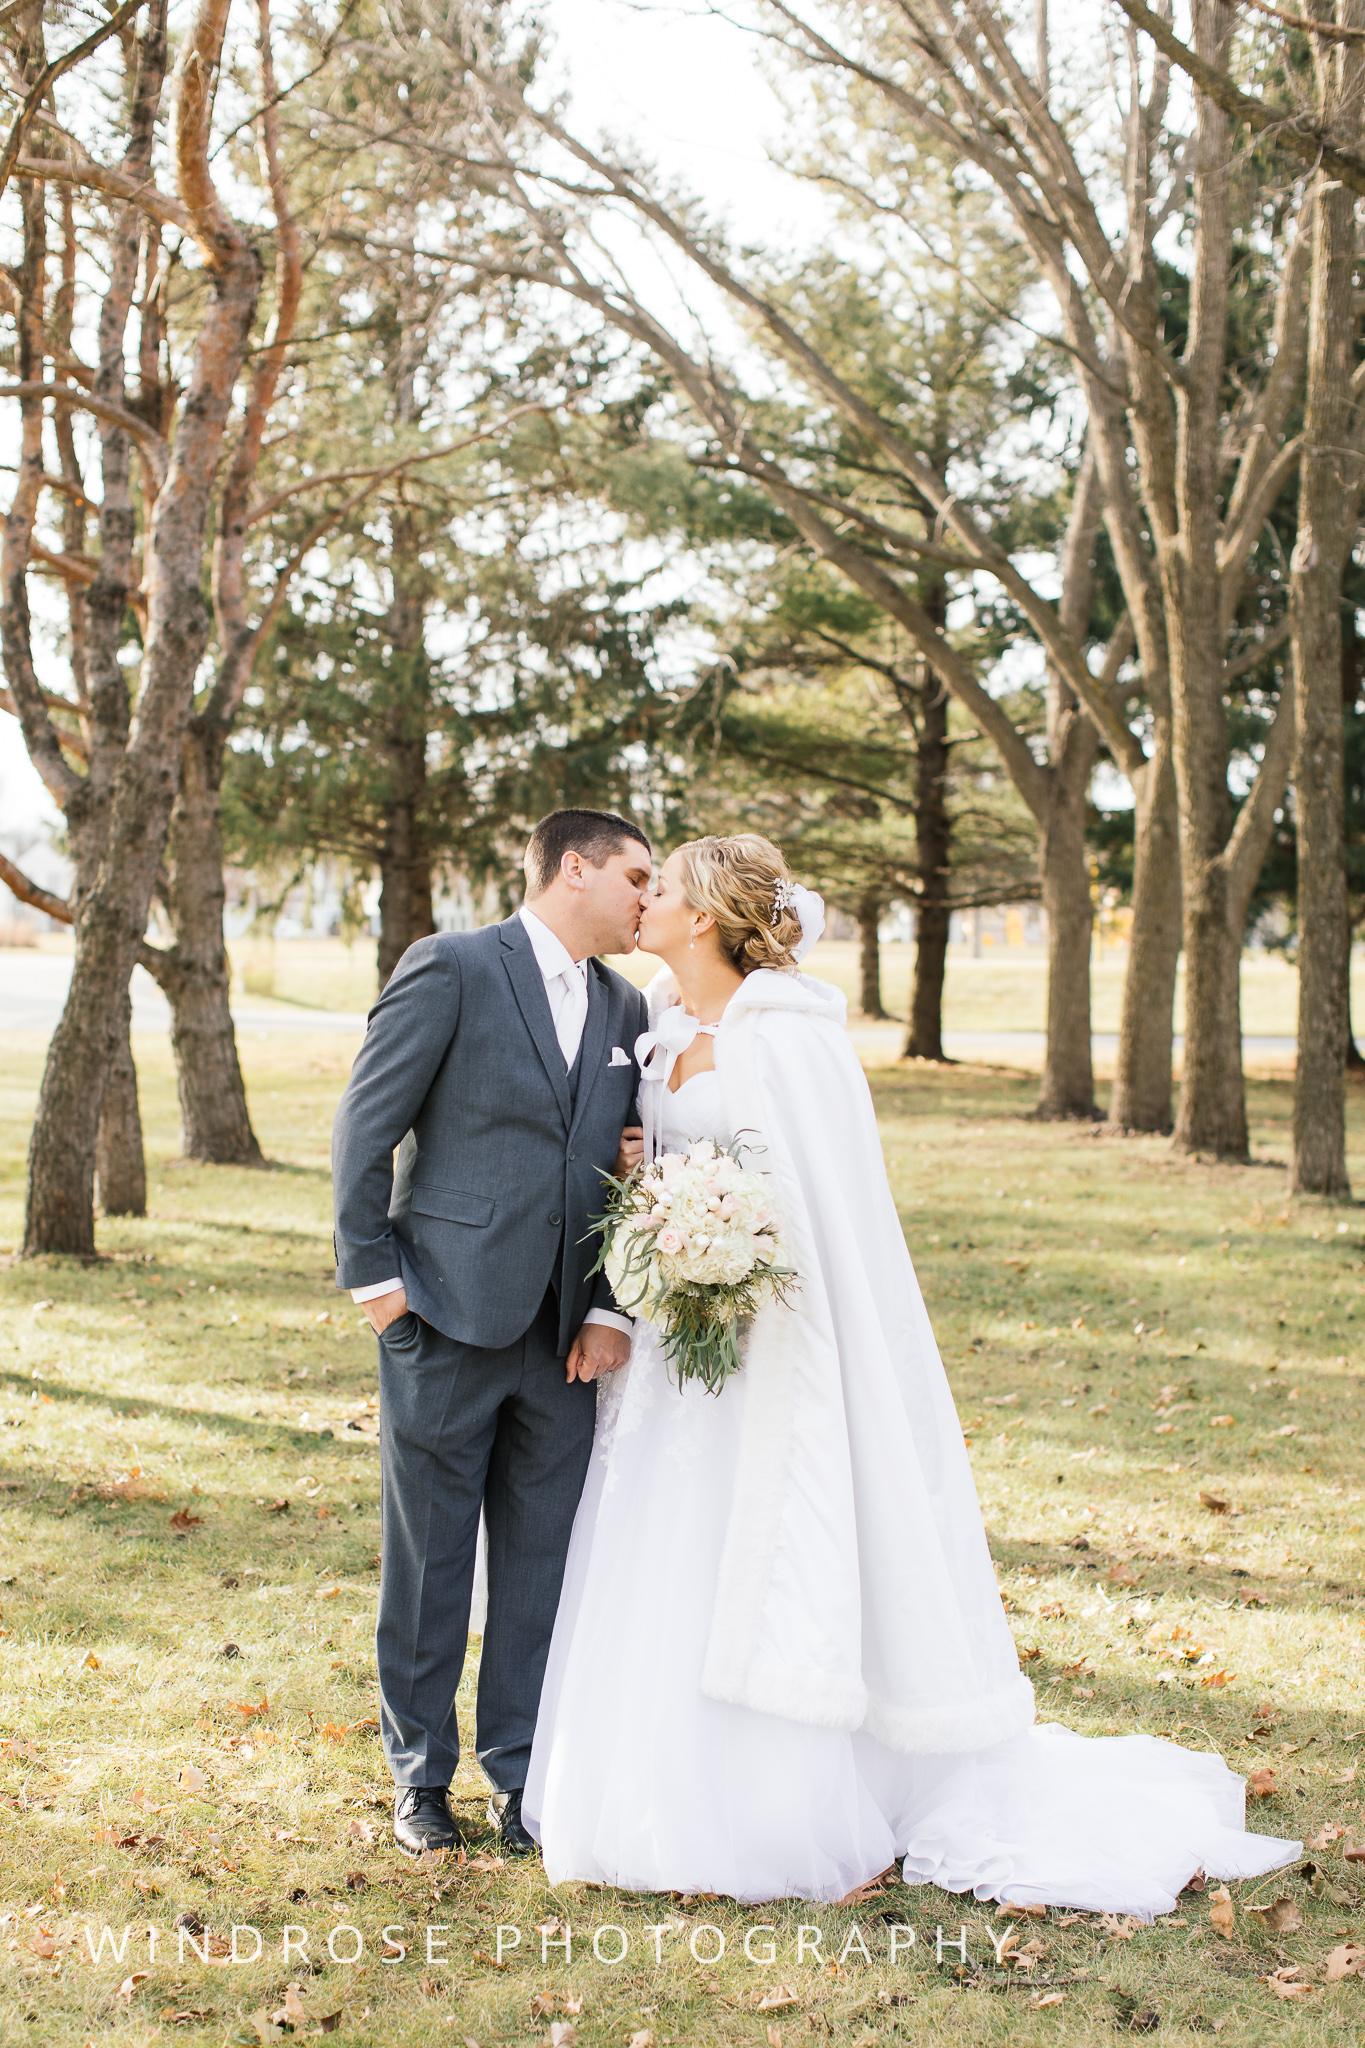 Rochester-MN-Wedding-Photo-16.jpg